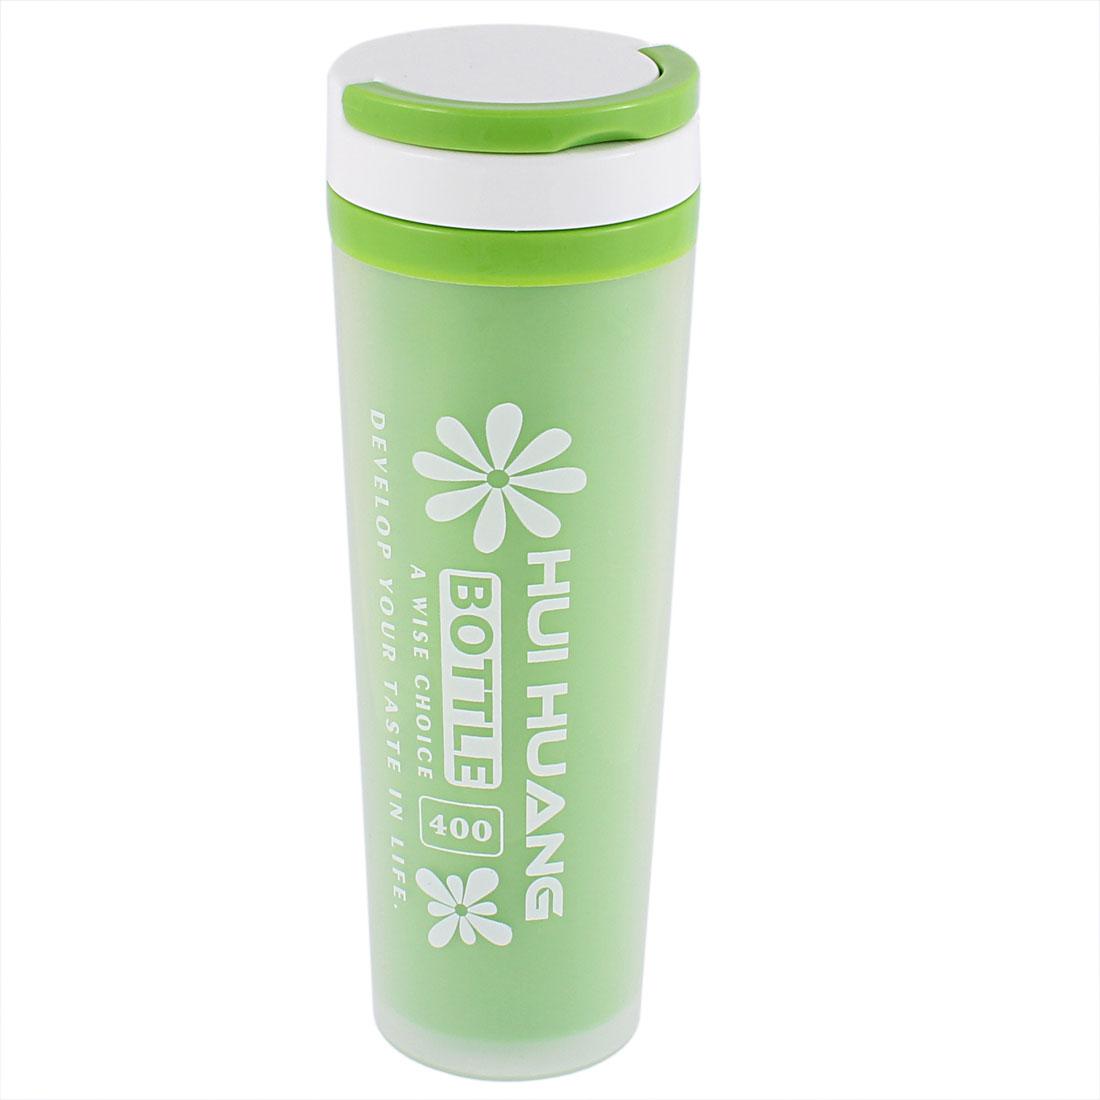 Water Tea Coffee Insulated Heat Retaining Bottle Cup Mug Vacuum Flask 400ml Green